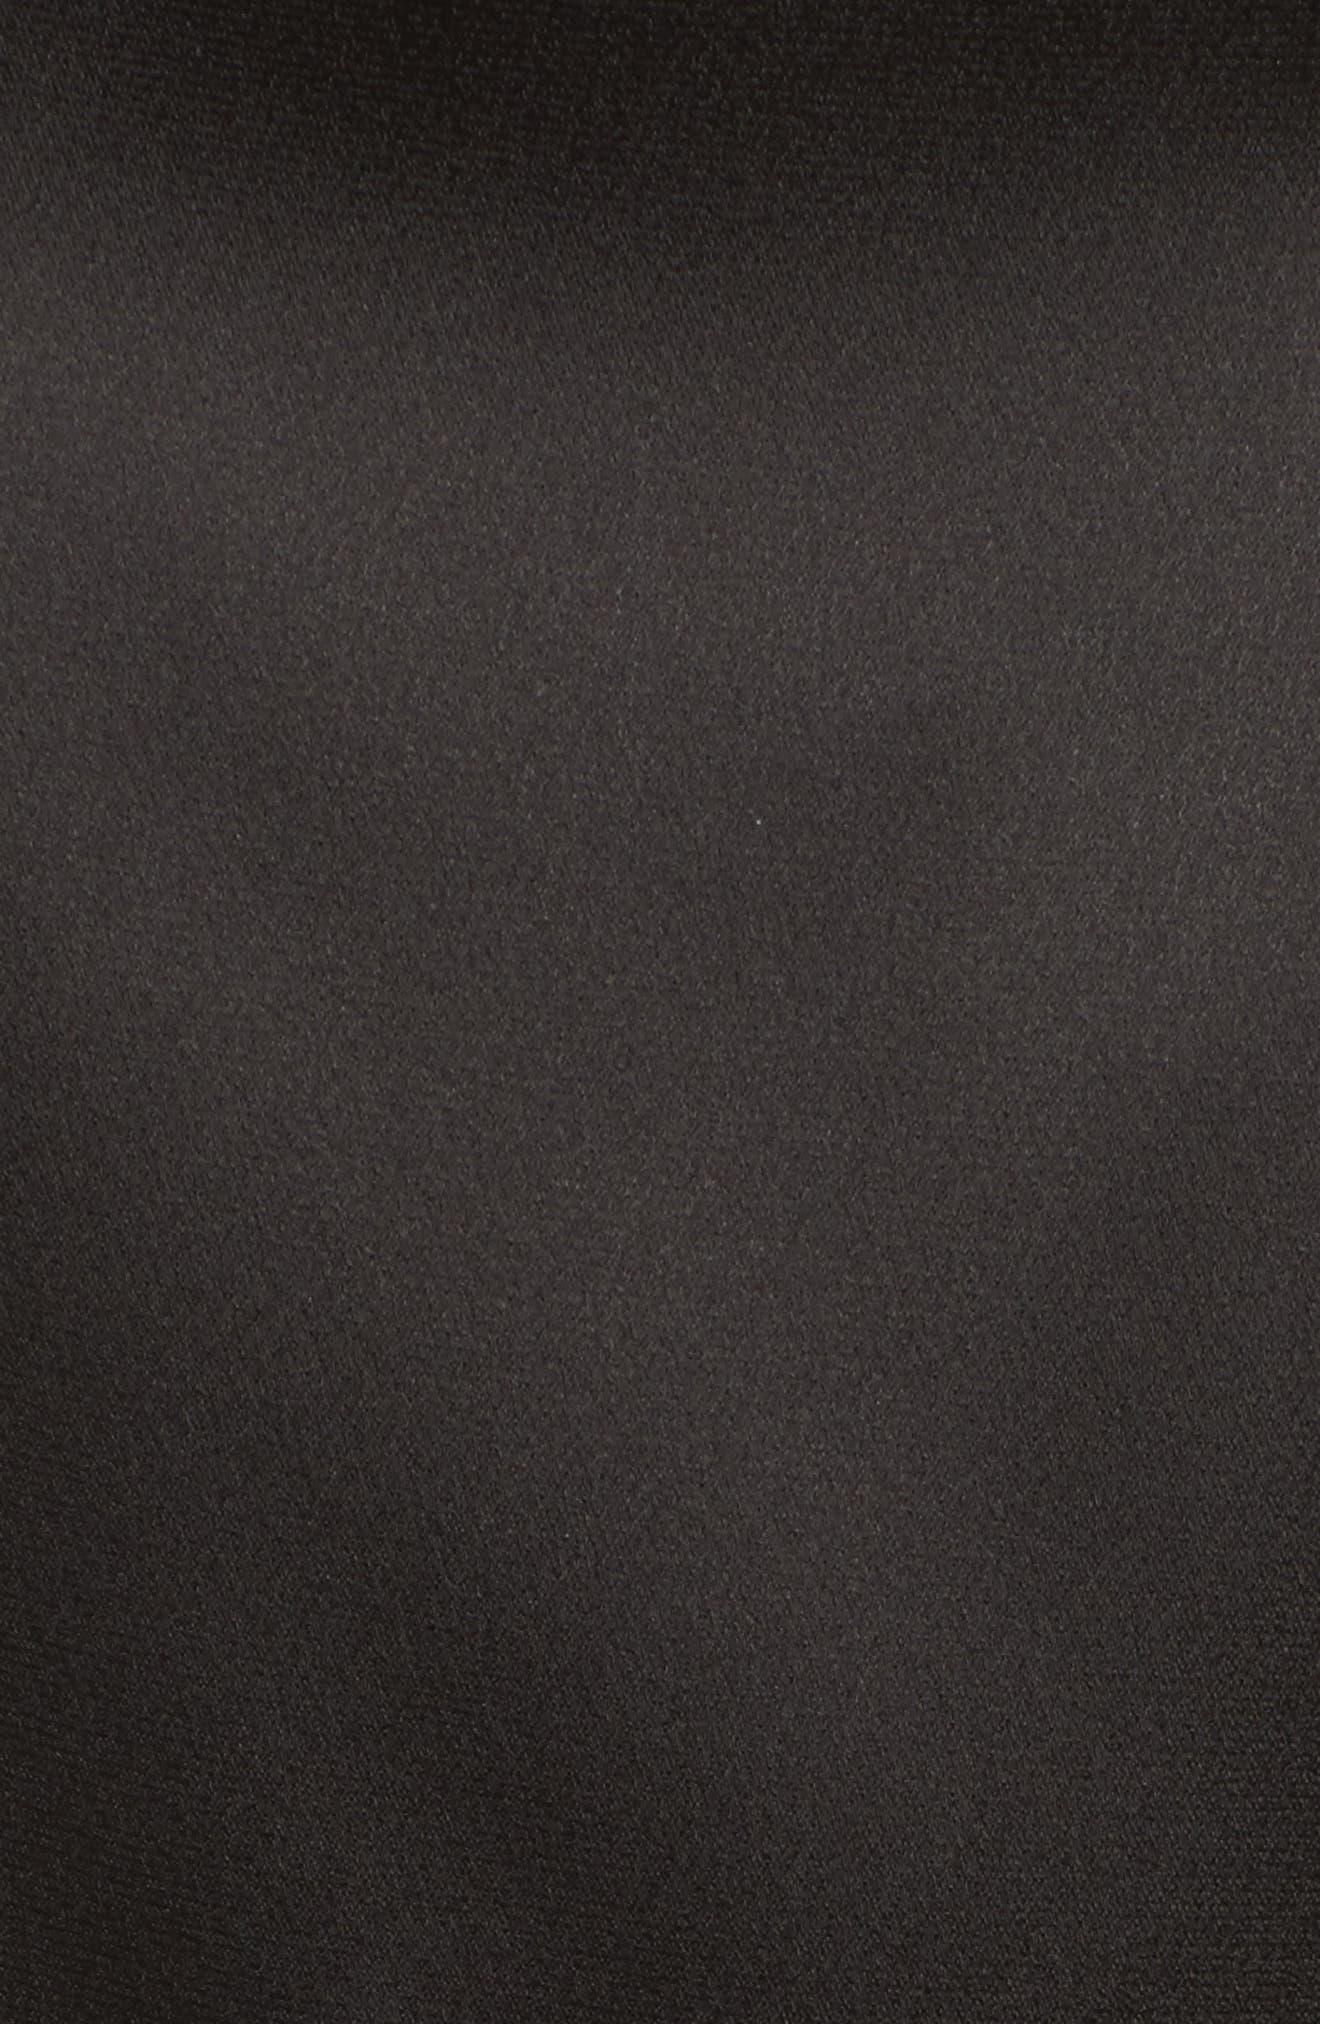 Drapena Faux Wrap Sheath Dress,                             Alternate thumbnail 5, color,                             Black